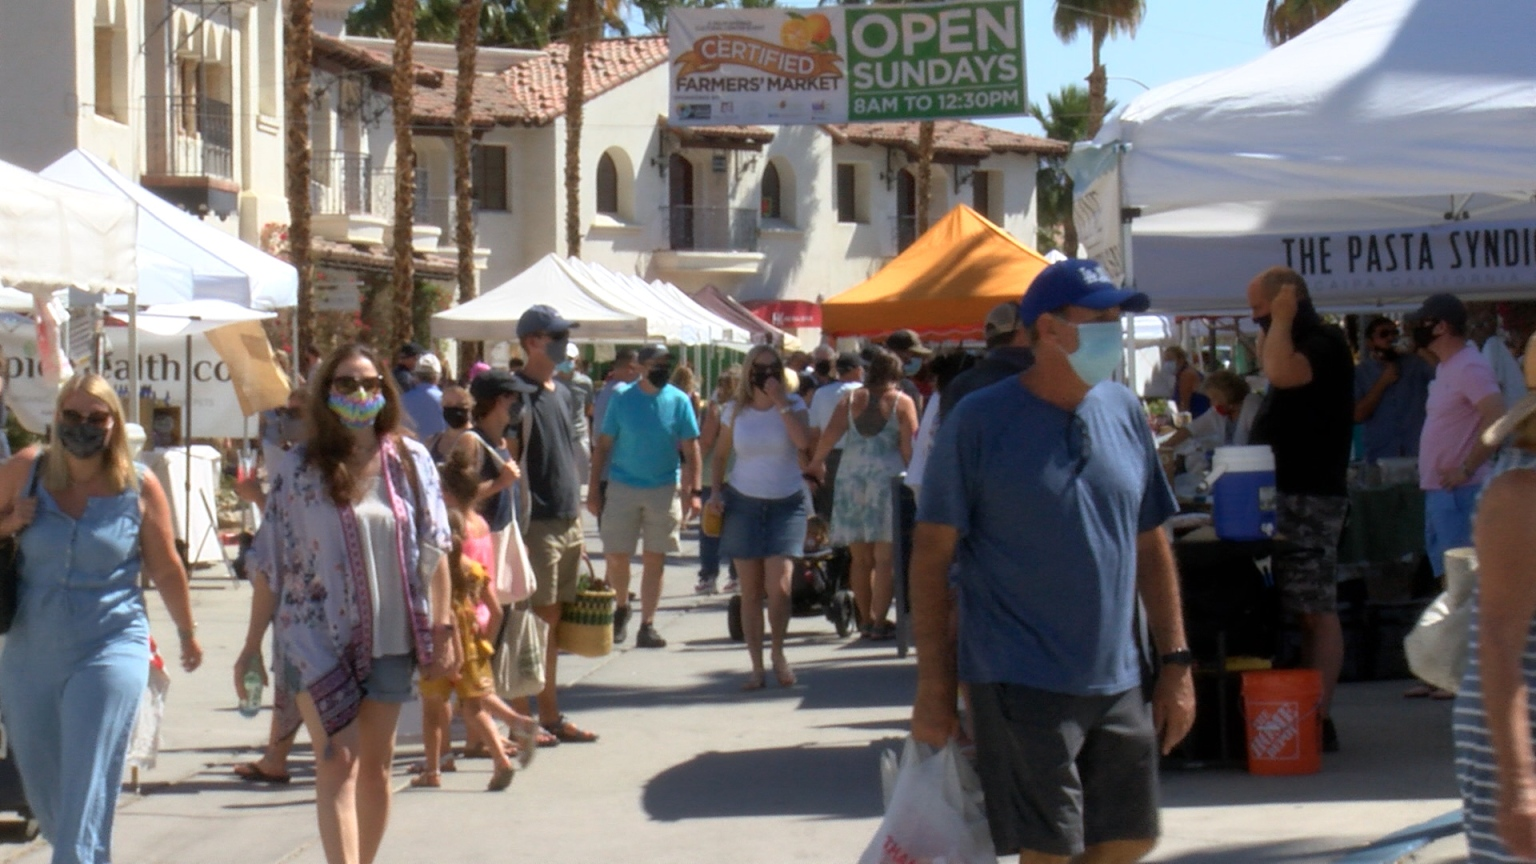 Farmers Market Vendors Prepare For Triple Digit Heat